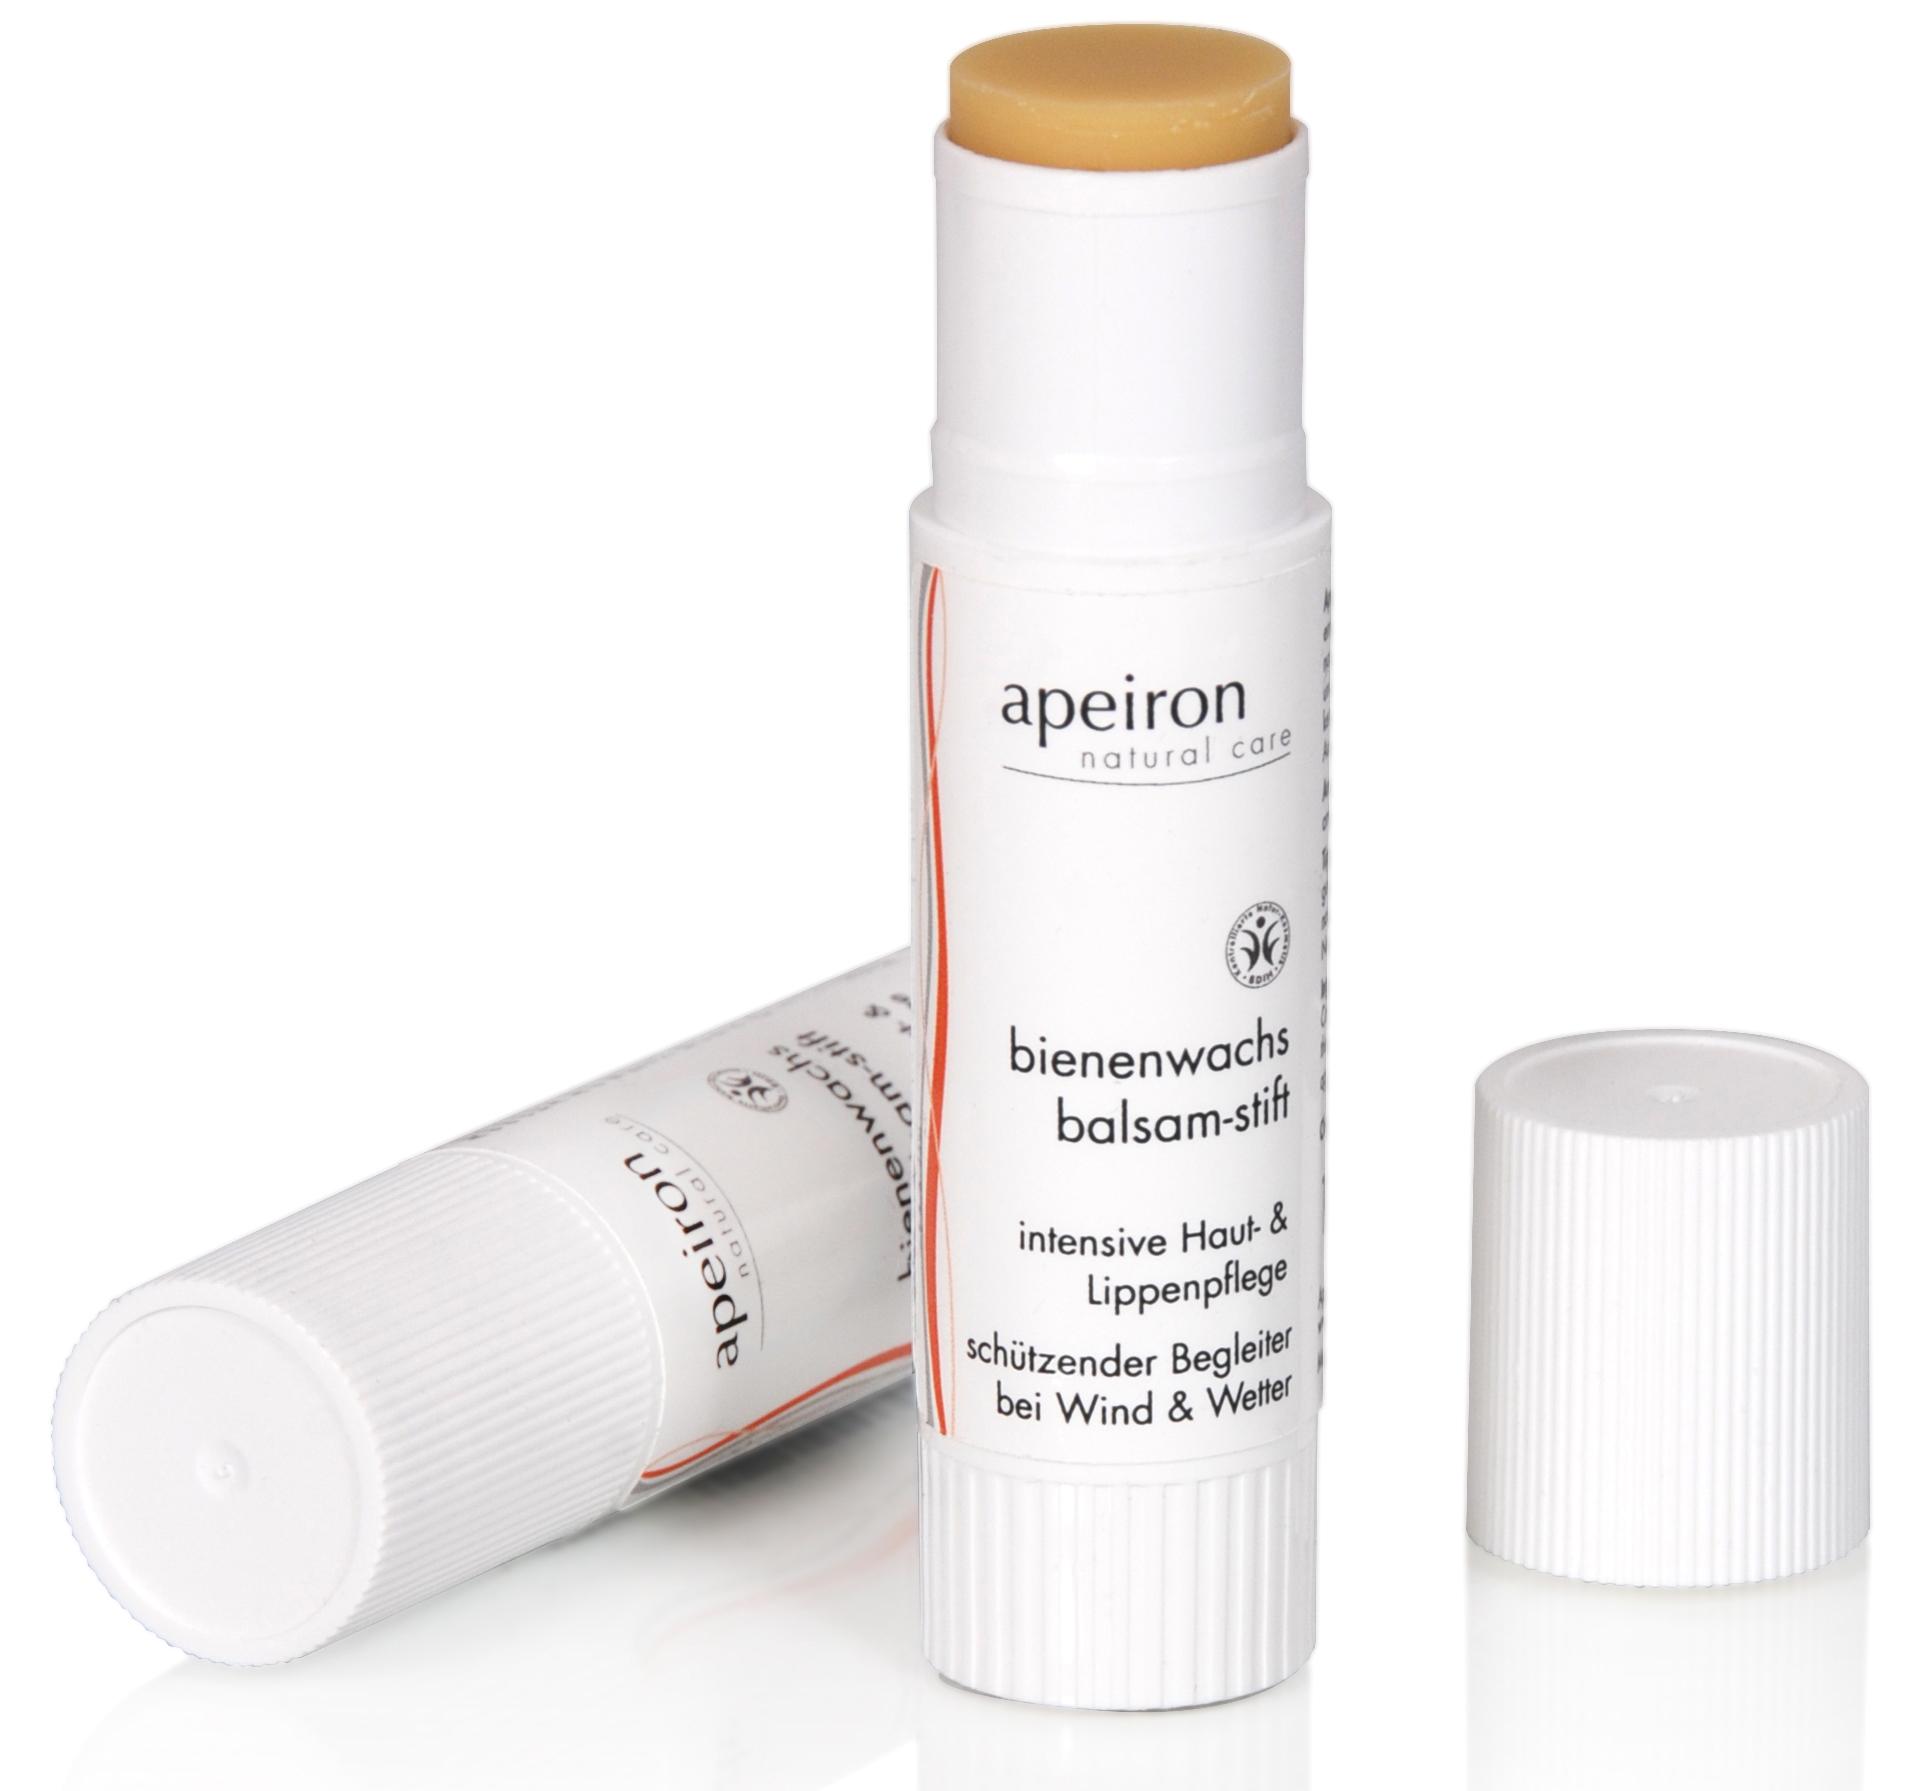 Bienenwachs Balsam-Stift - intensive Haut & Lippenpflege